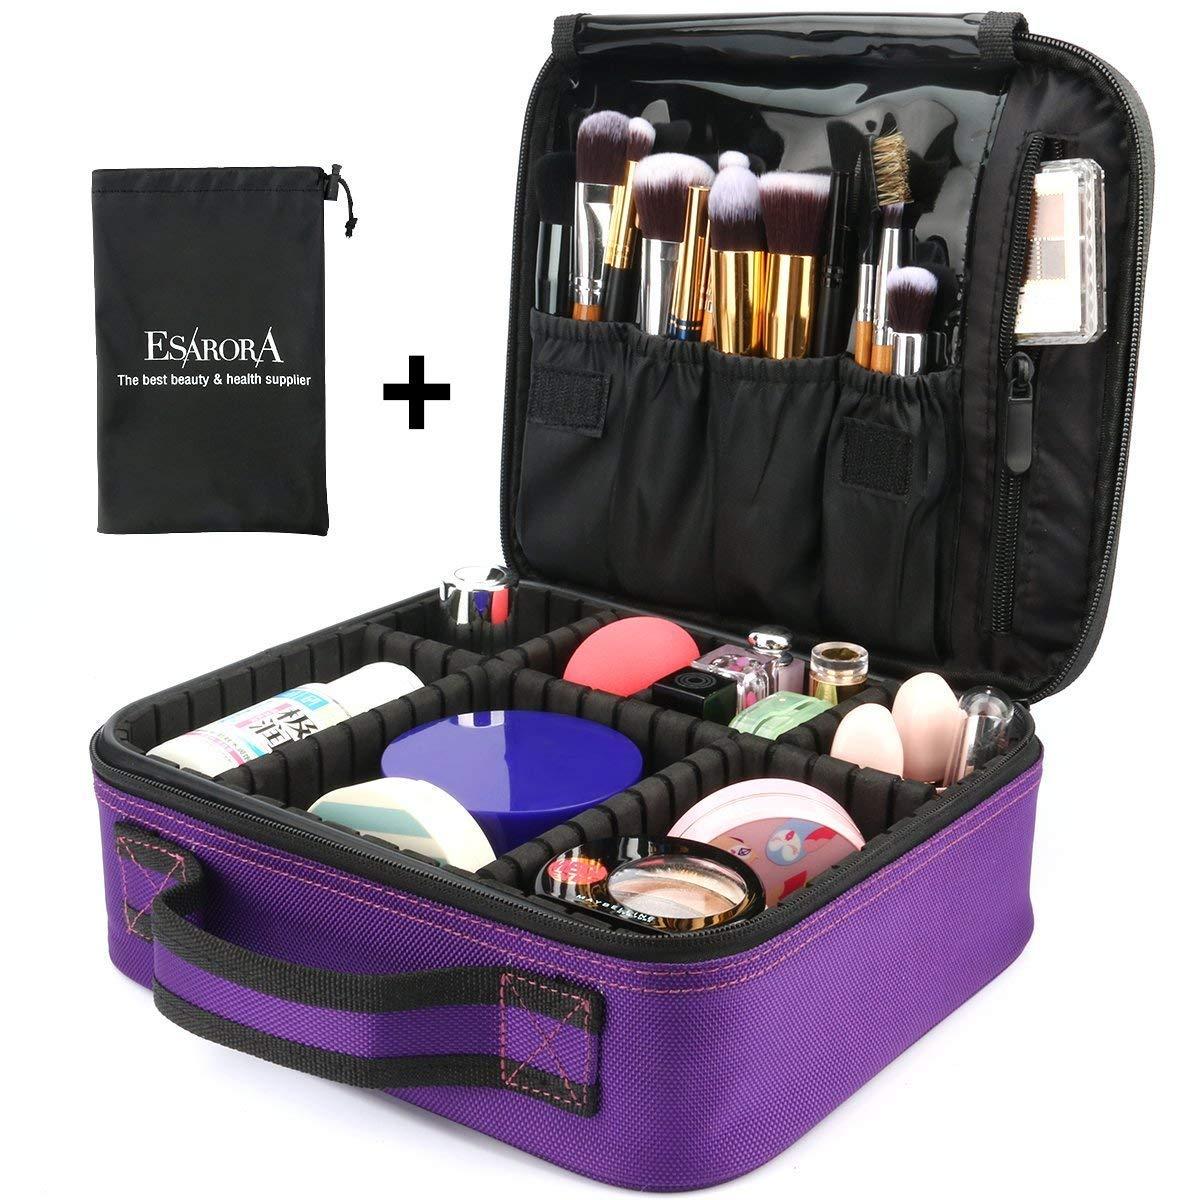 B078LRC2DK Makeup Bag ESARORA Portable Travel Makeup Cosmetic Case Organizer Artist Storage Bag with Adjustable Dividers for Cosmetics Makeup Brushes Toiletry Jewelry Digital Accessories (Purple)